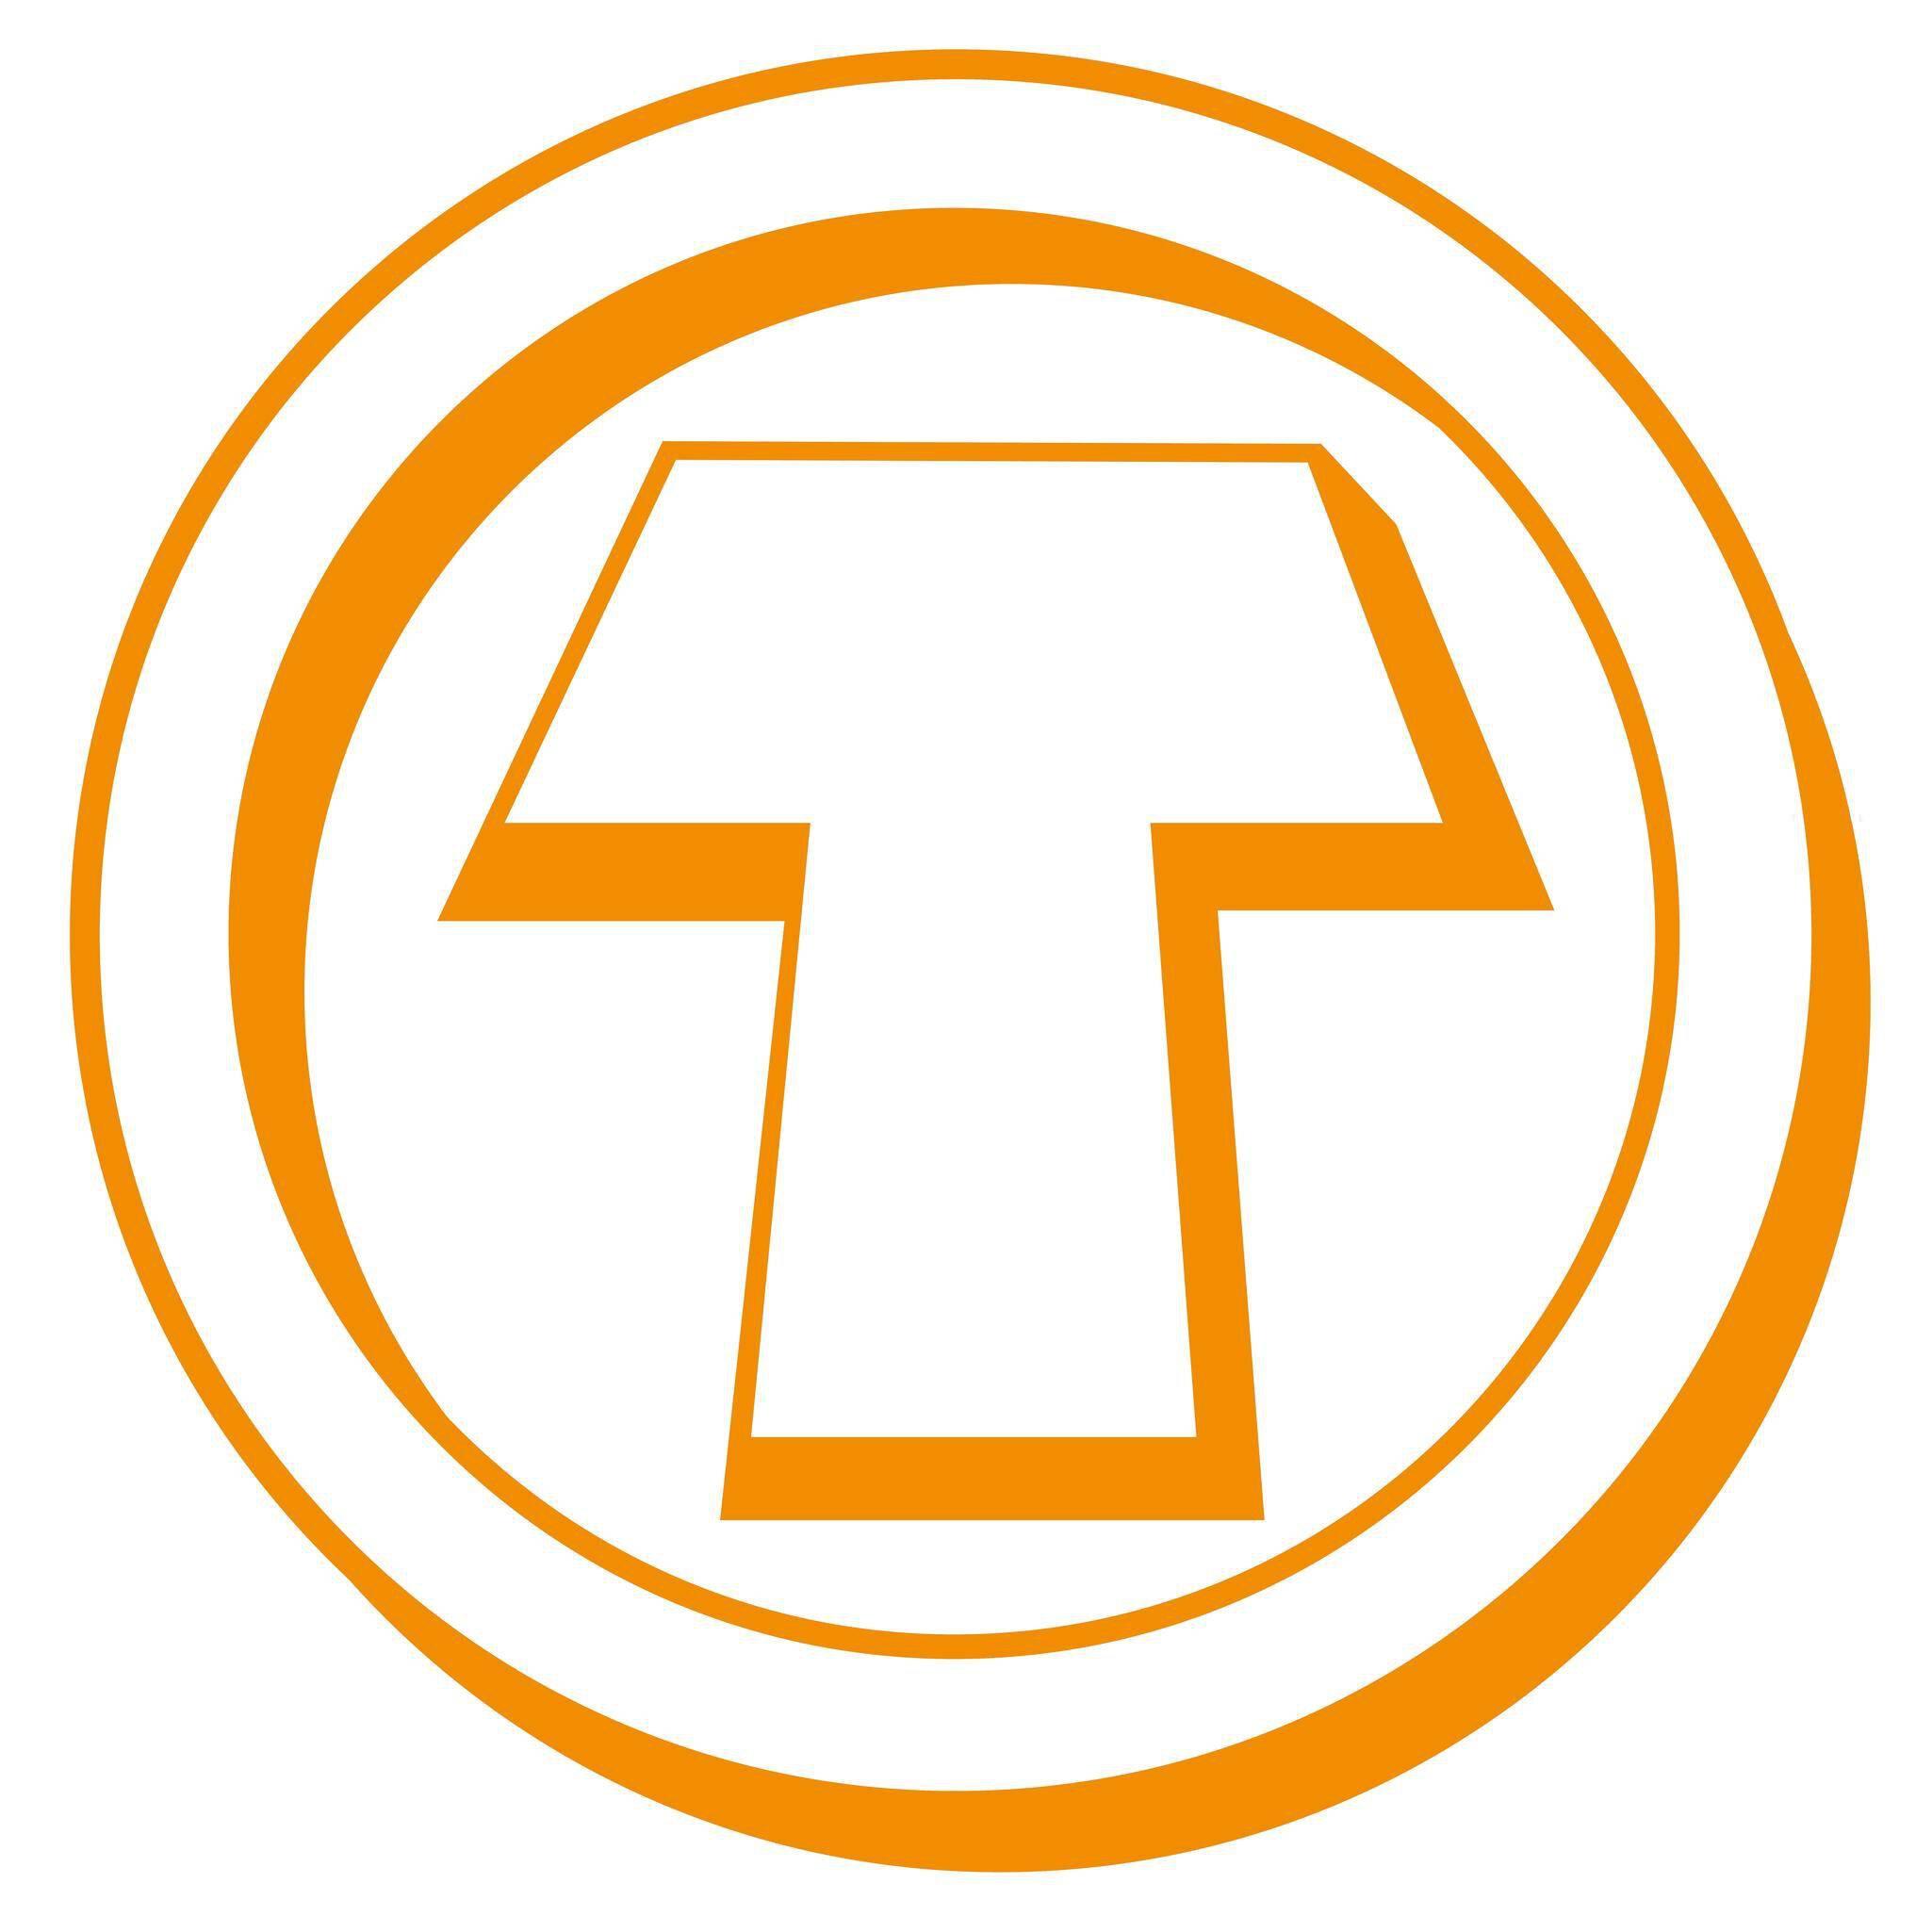 Company logo of TM.E. S.p.A. - Termomeccanica Ecologia